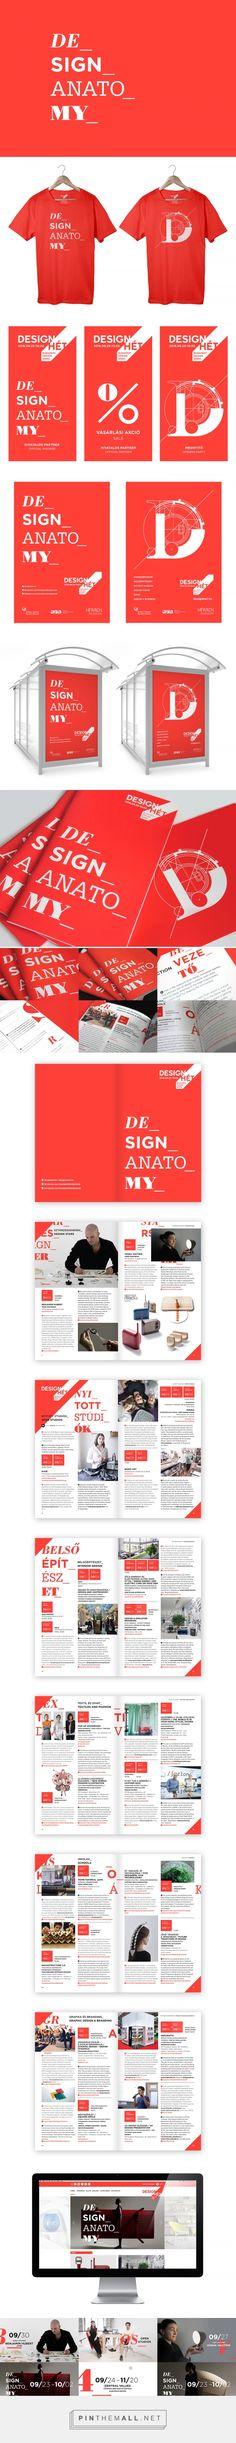 Budapest Design Week, 2016 on Behance